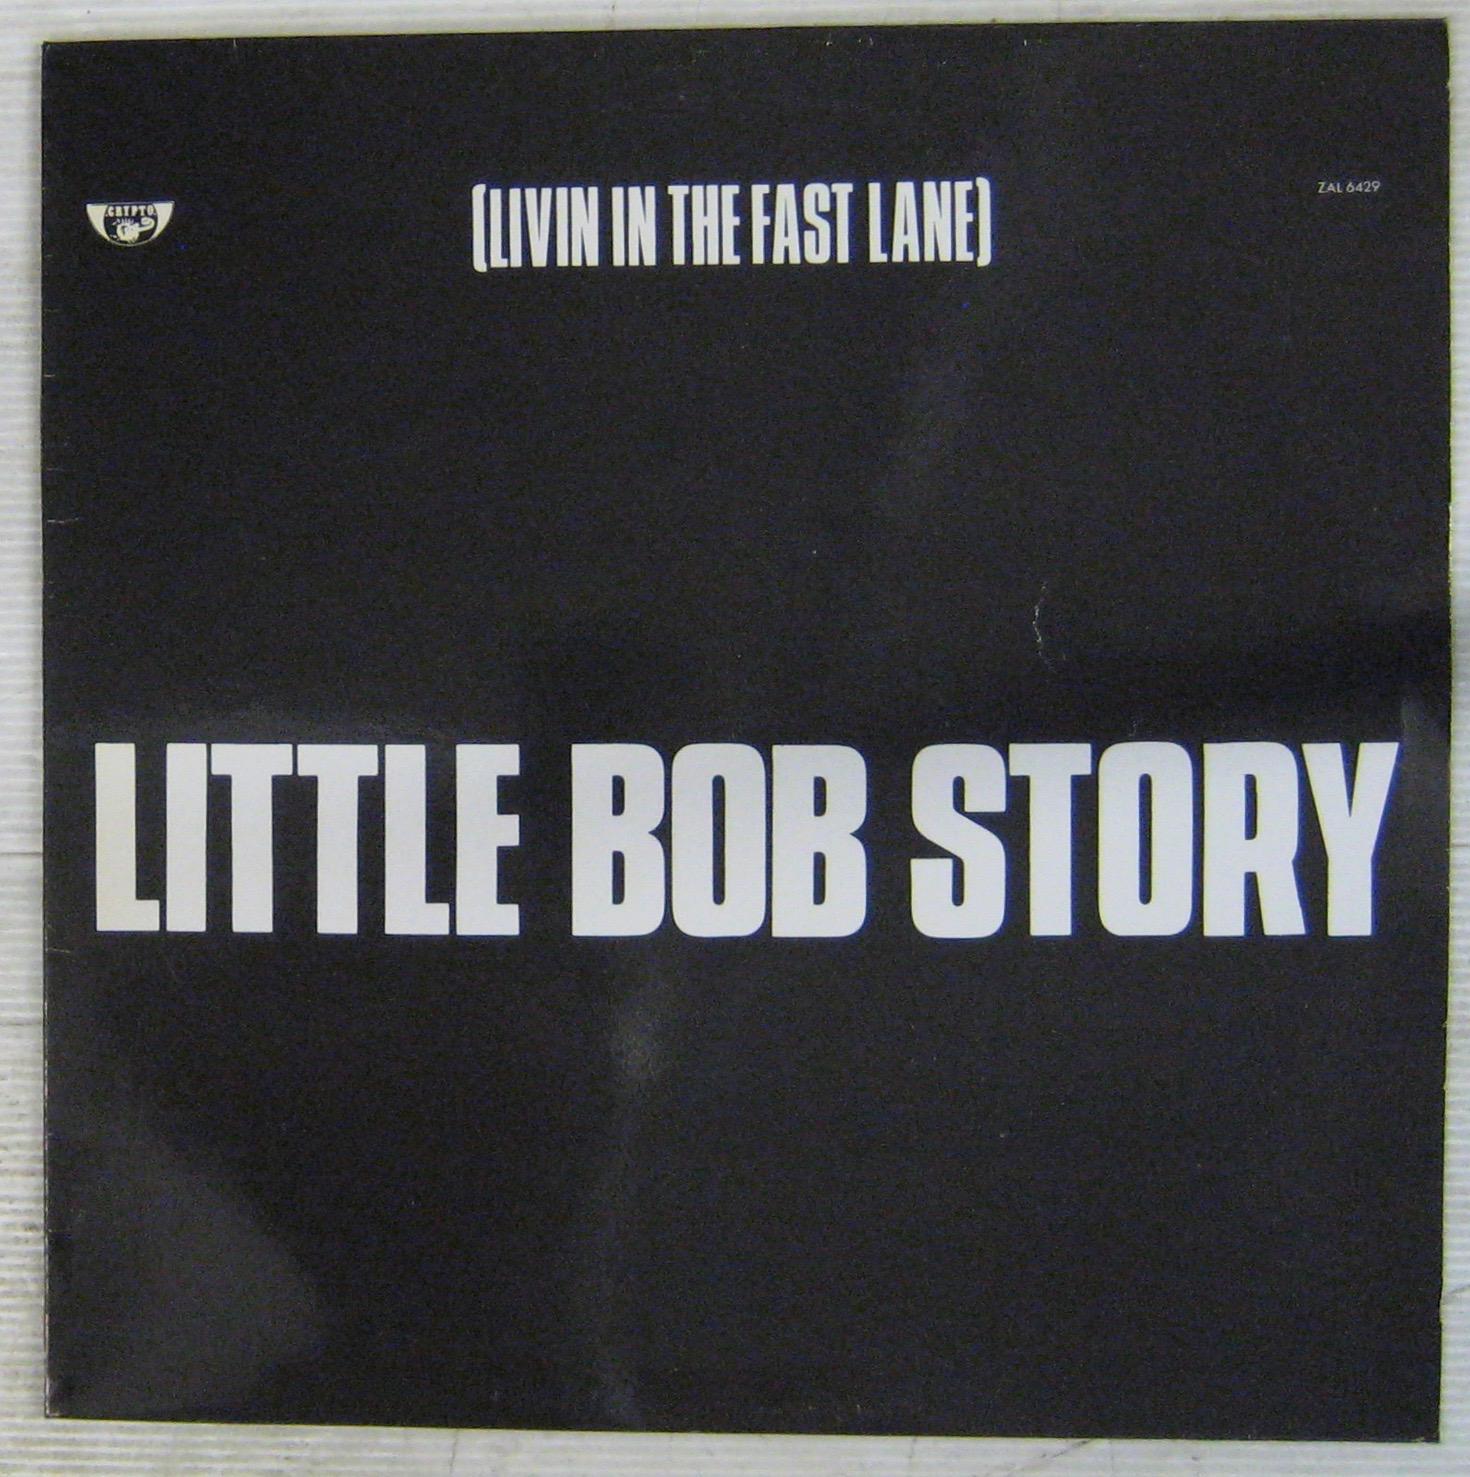 Little Bob Story Livin' in the fast lane